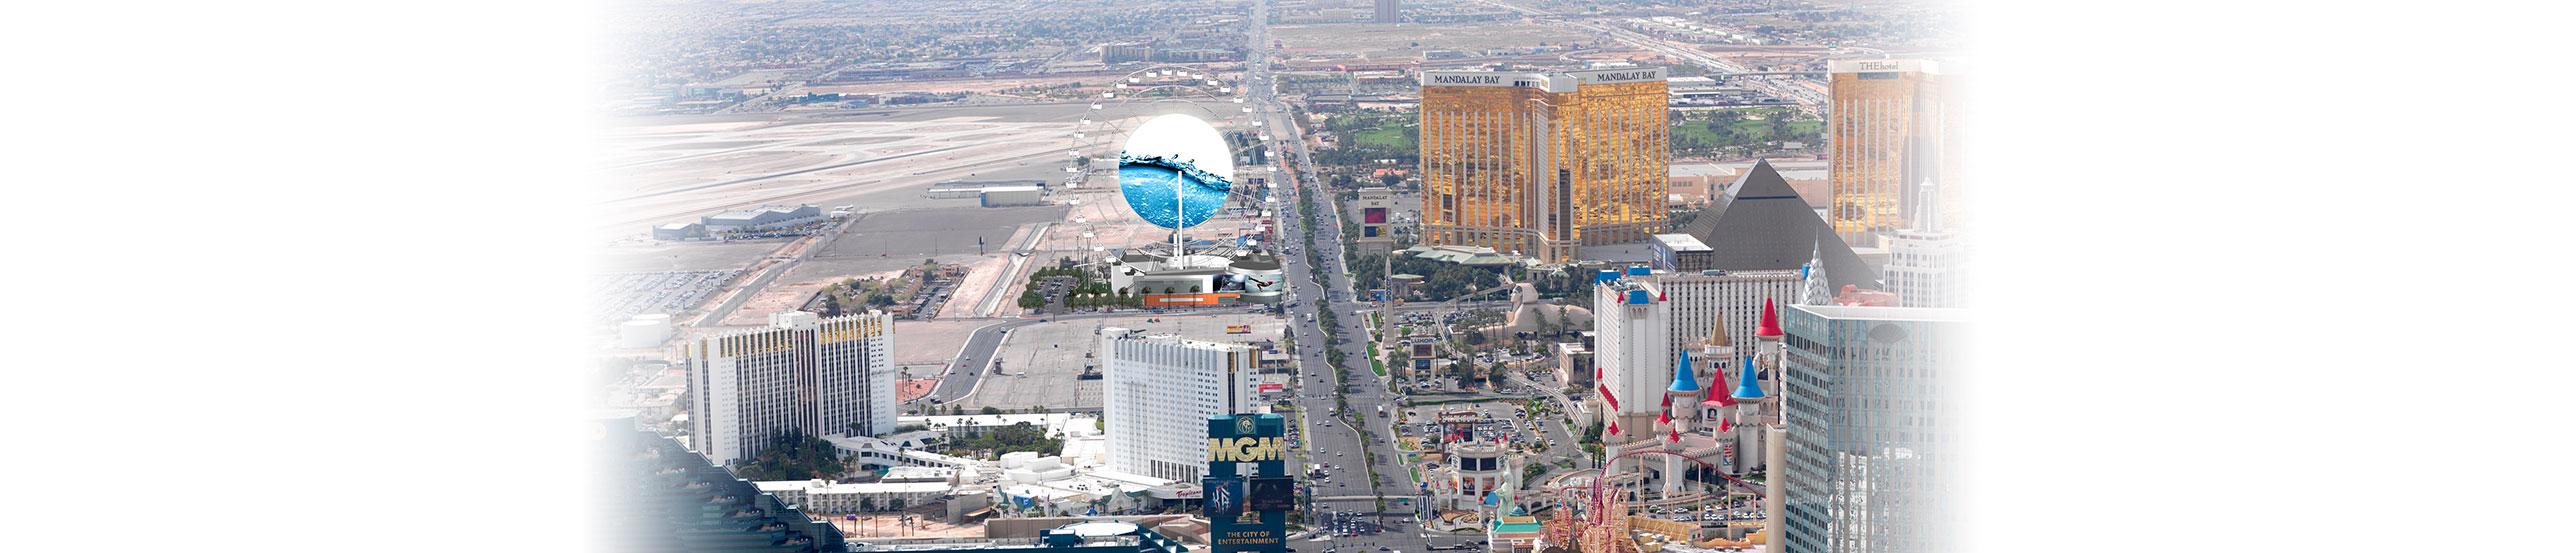 SkyVue Las Vegas 02